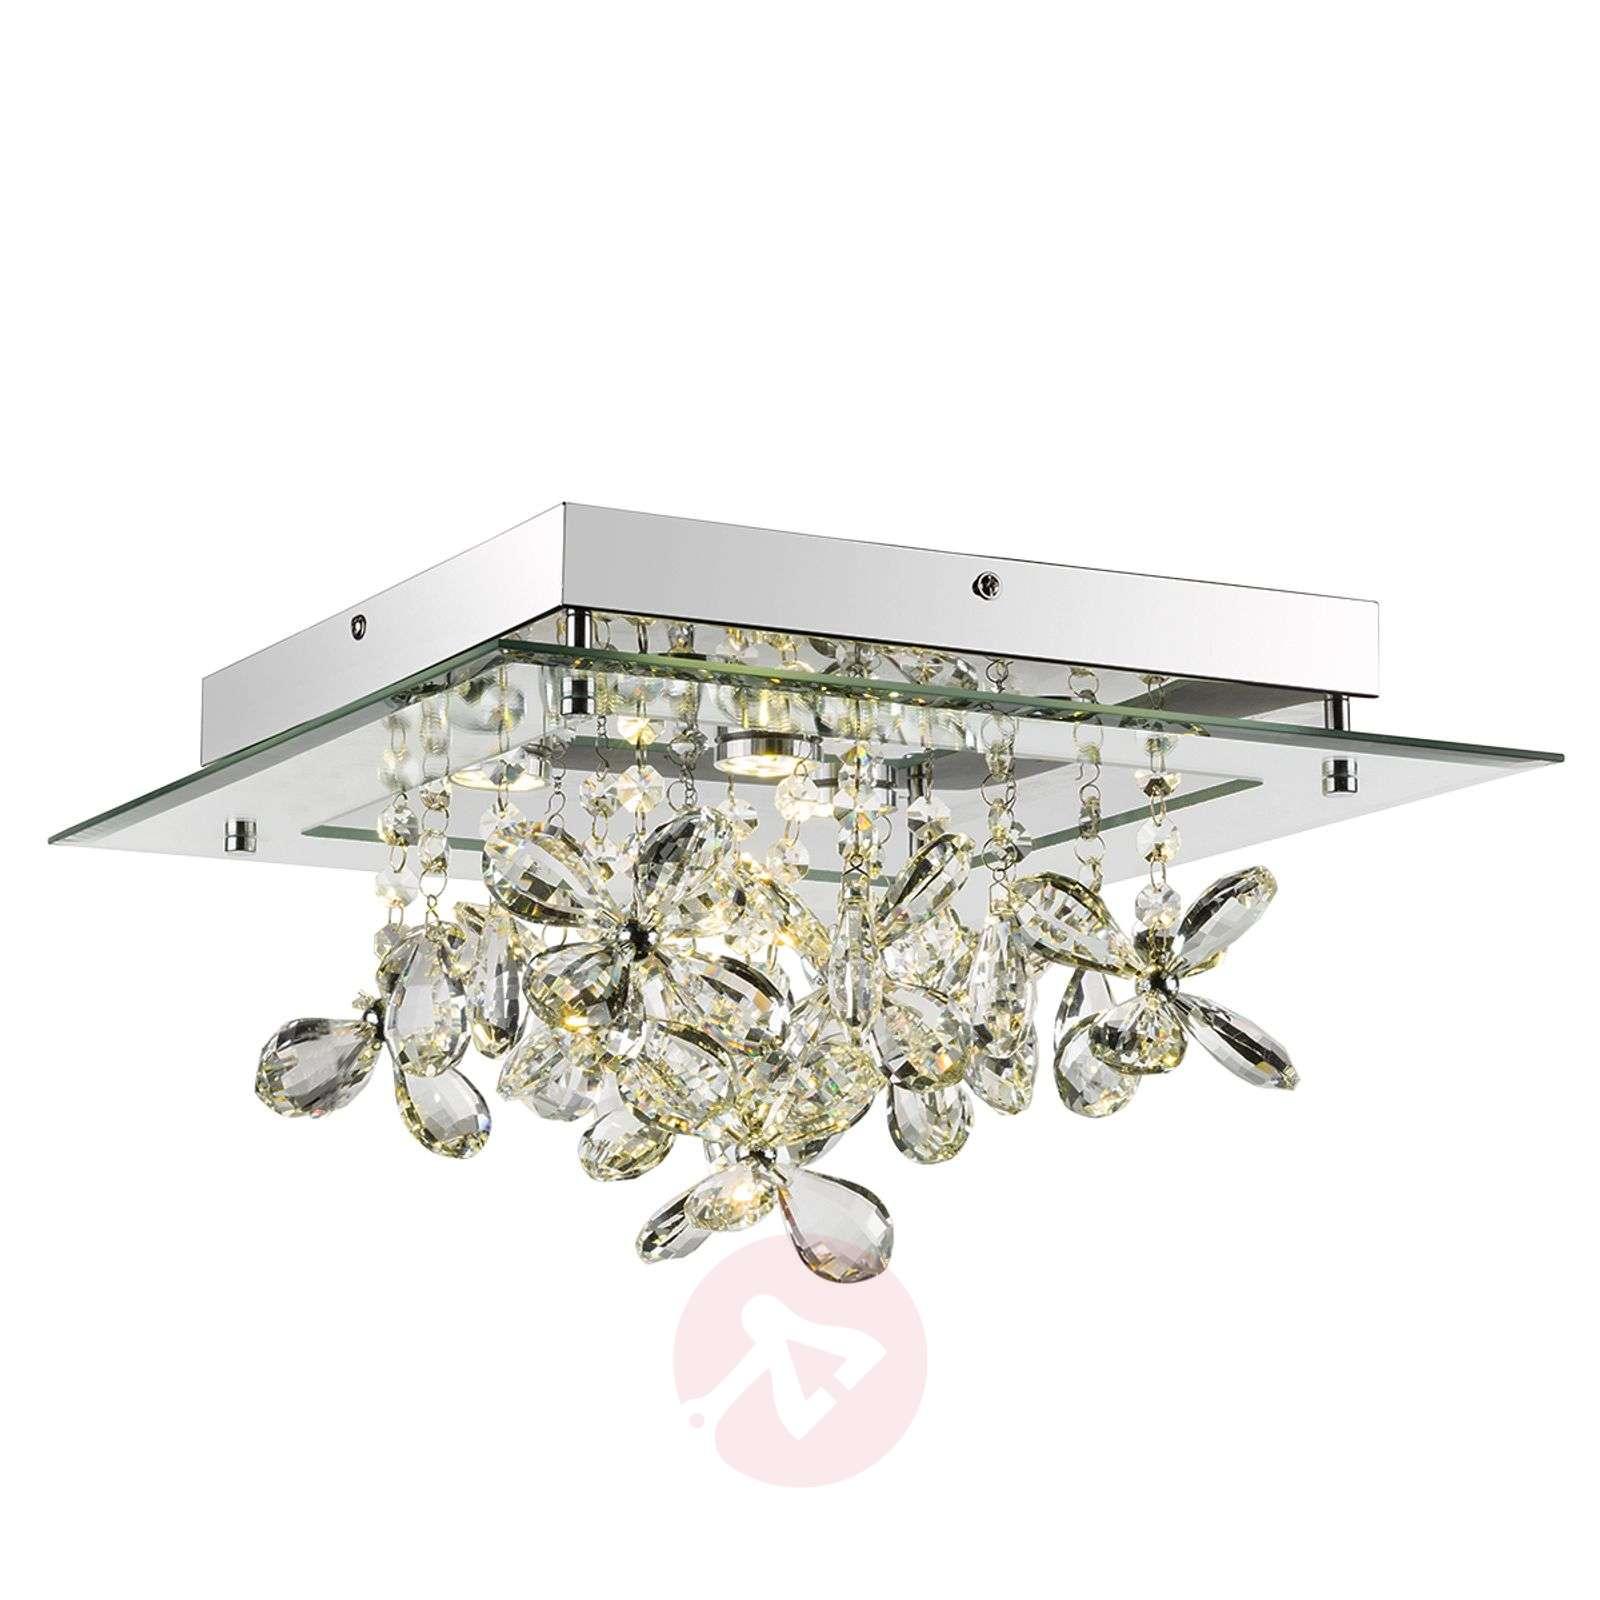 Heijastava LED-kattovalaisin Gese kristalleilla-4014803-01